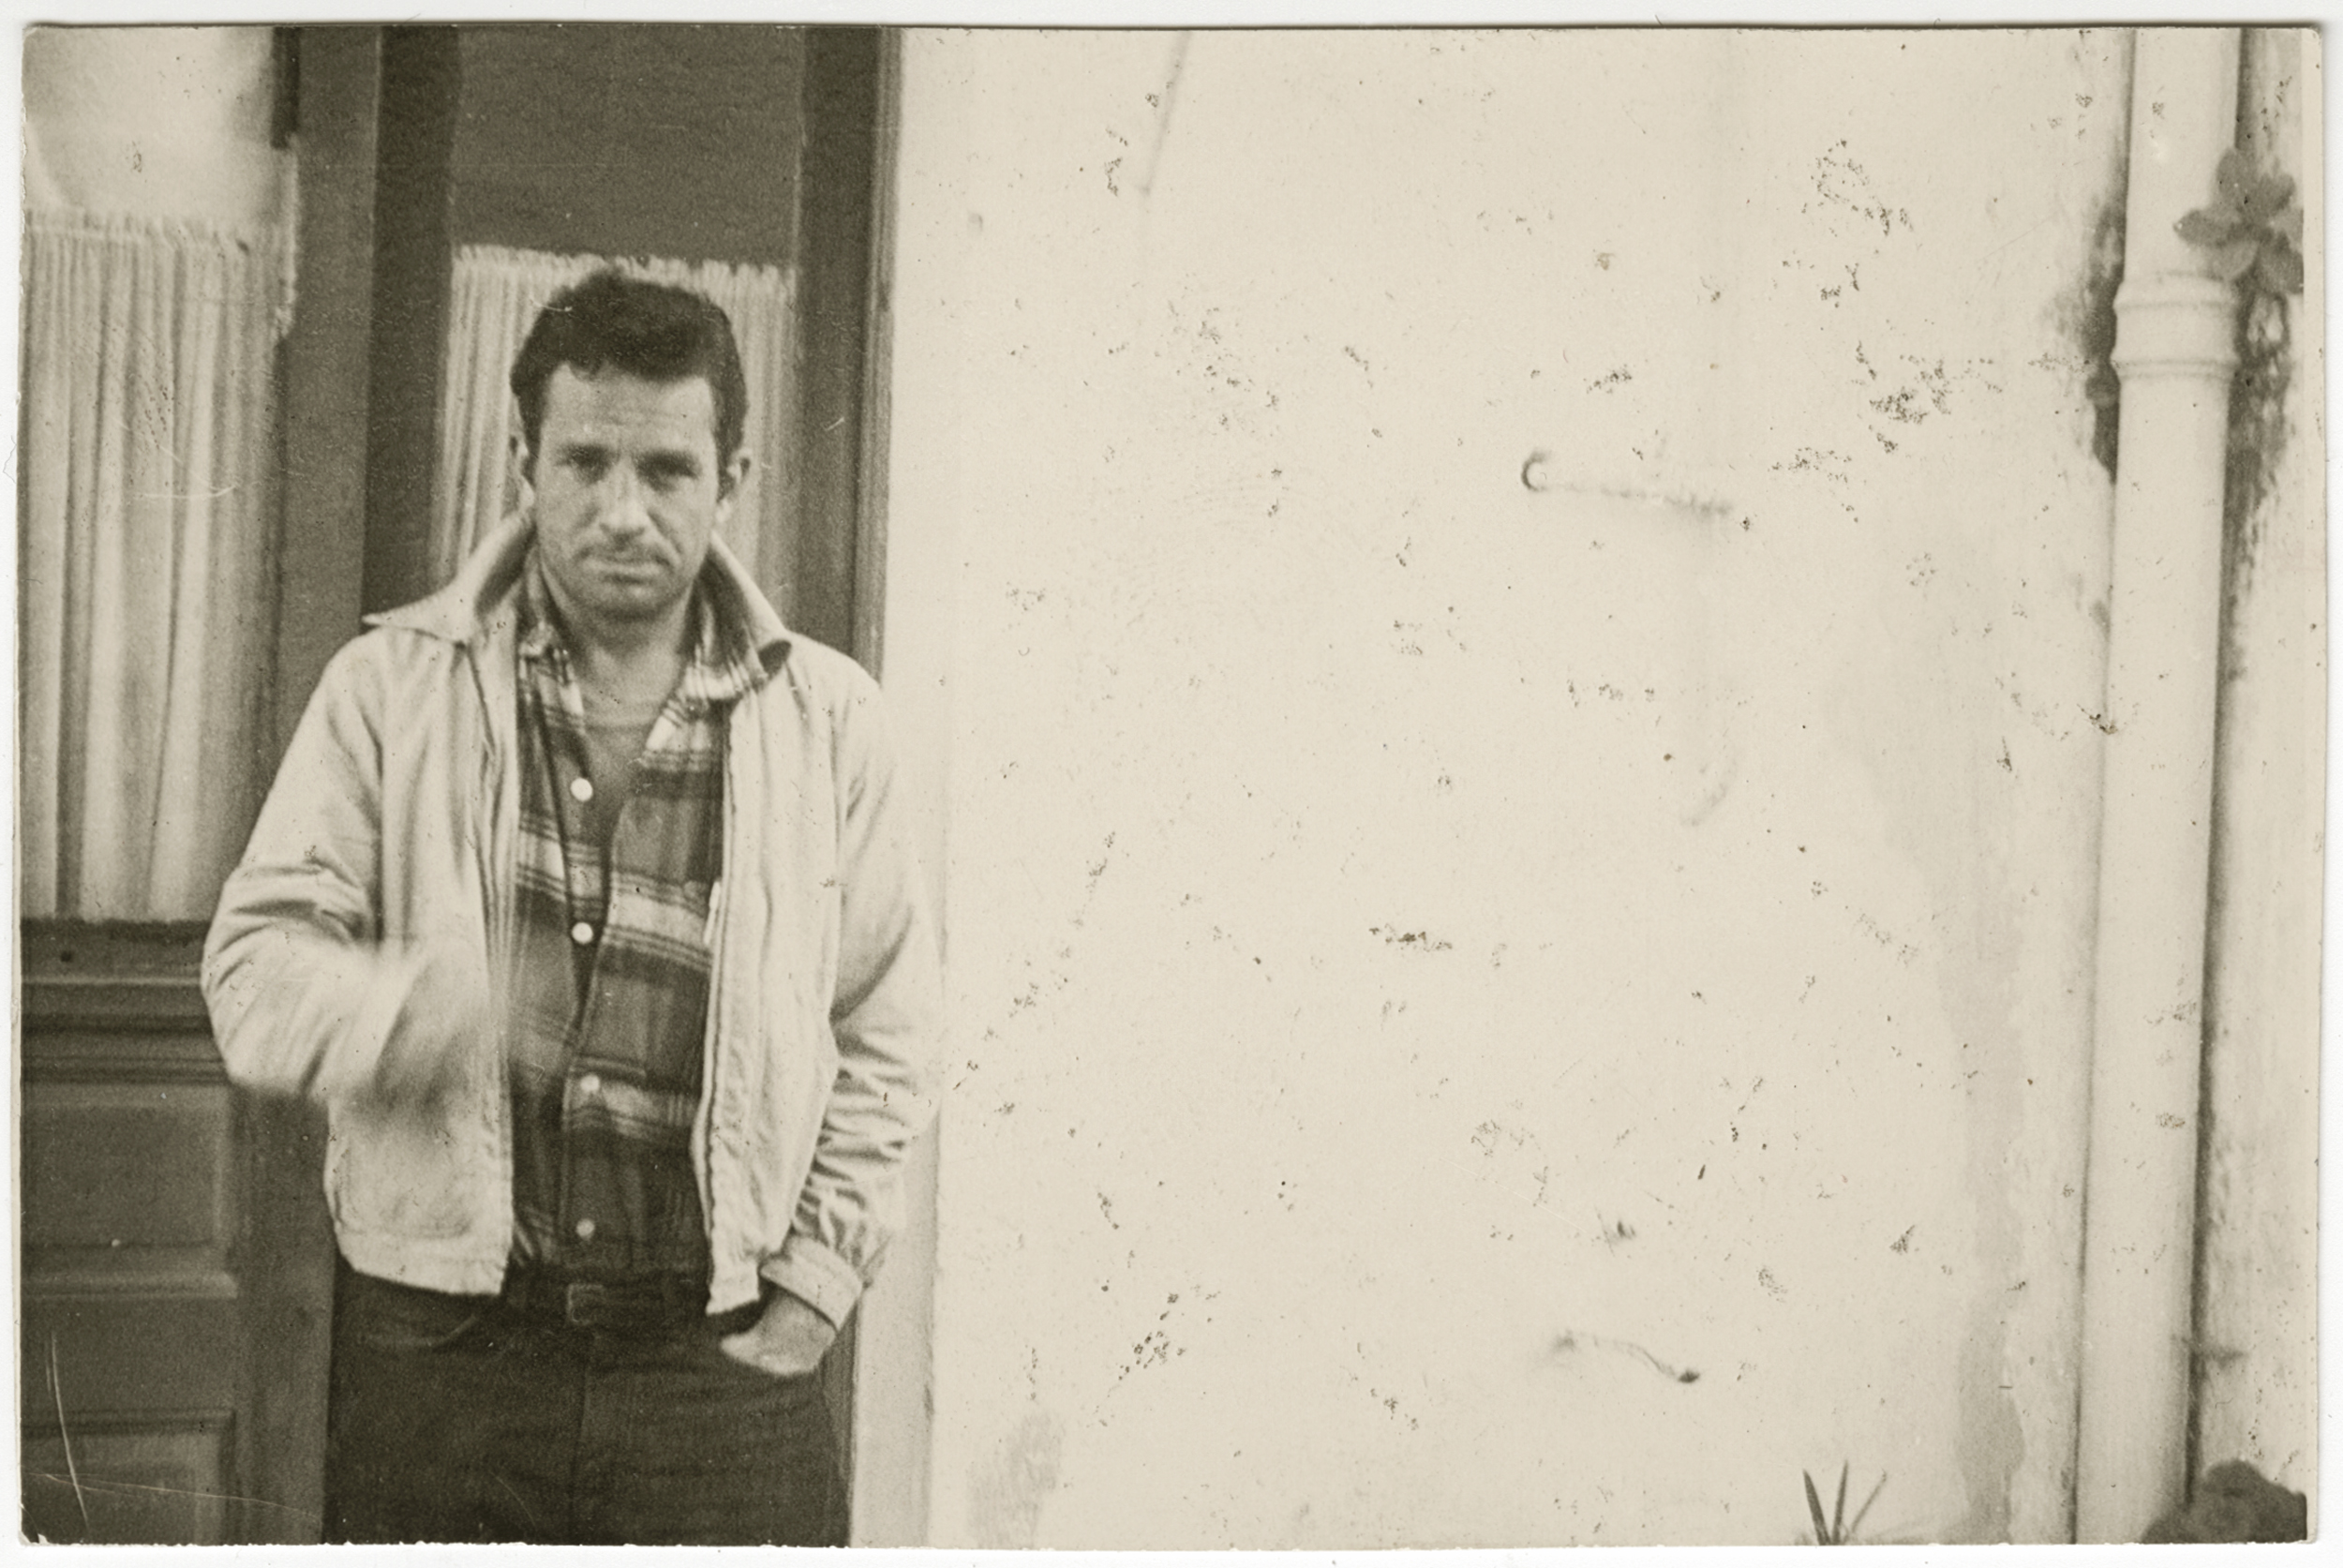 Jack Kerouac, Tangier, 1957